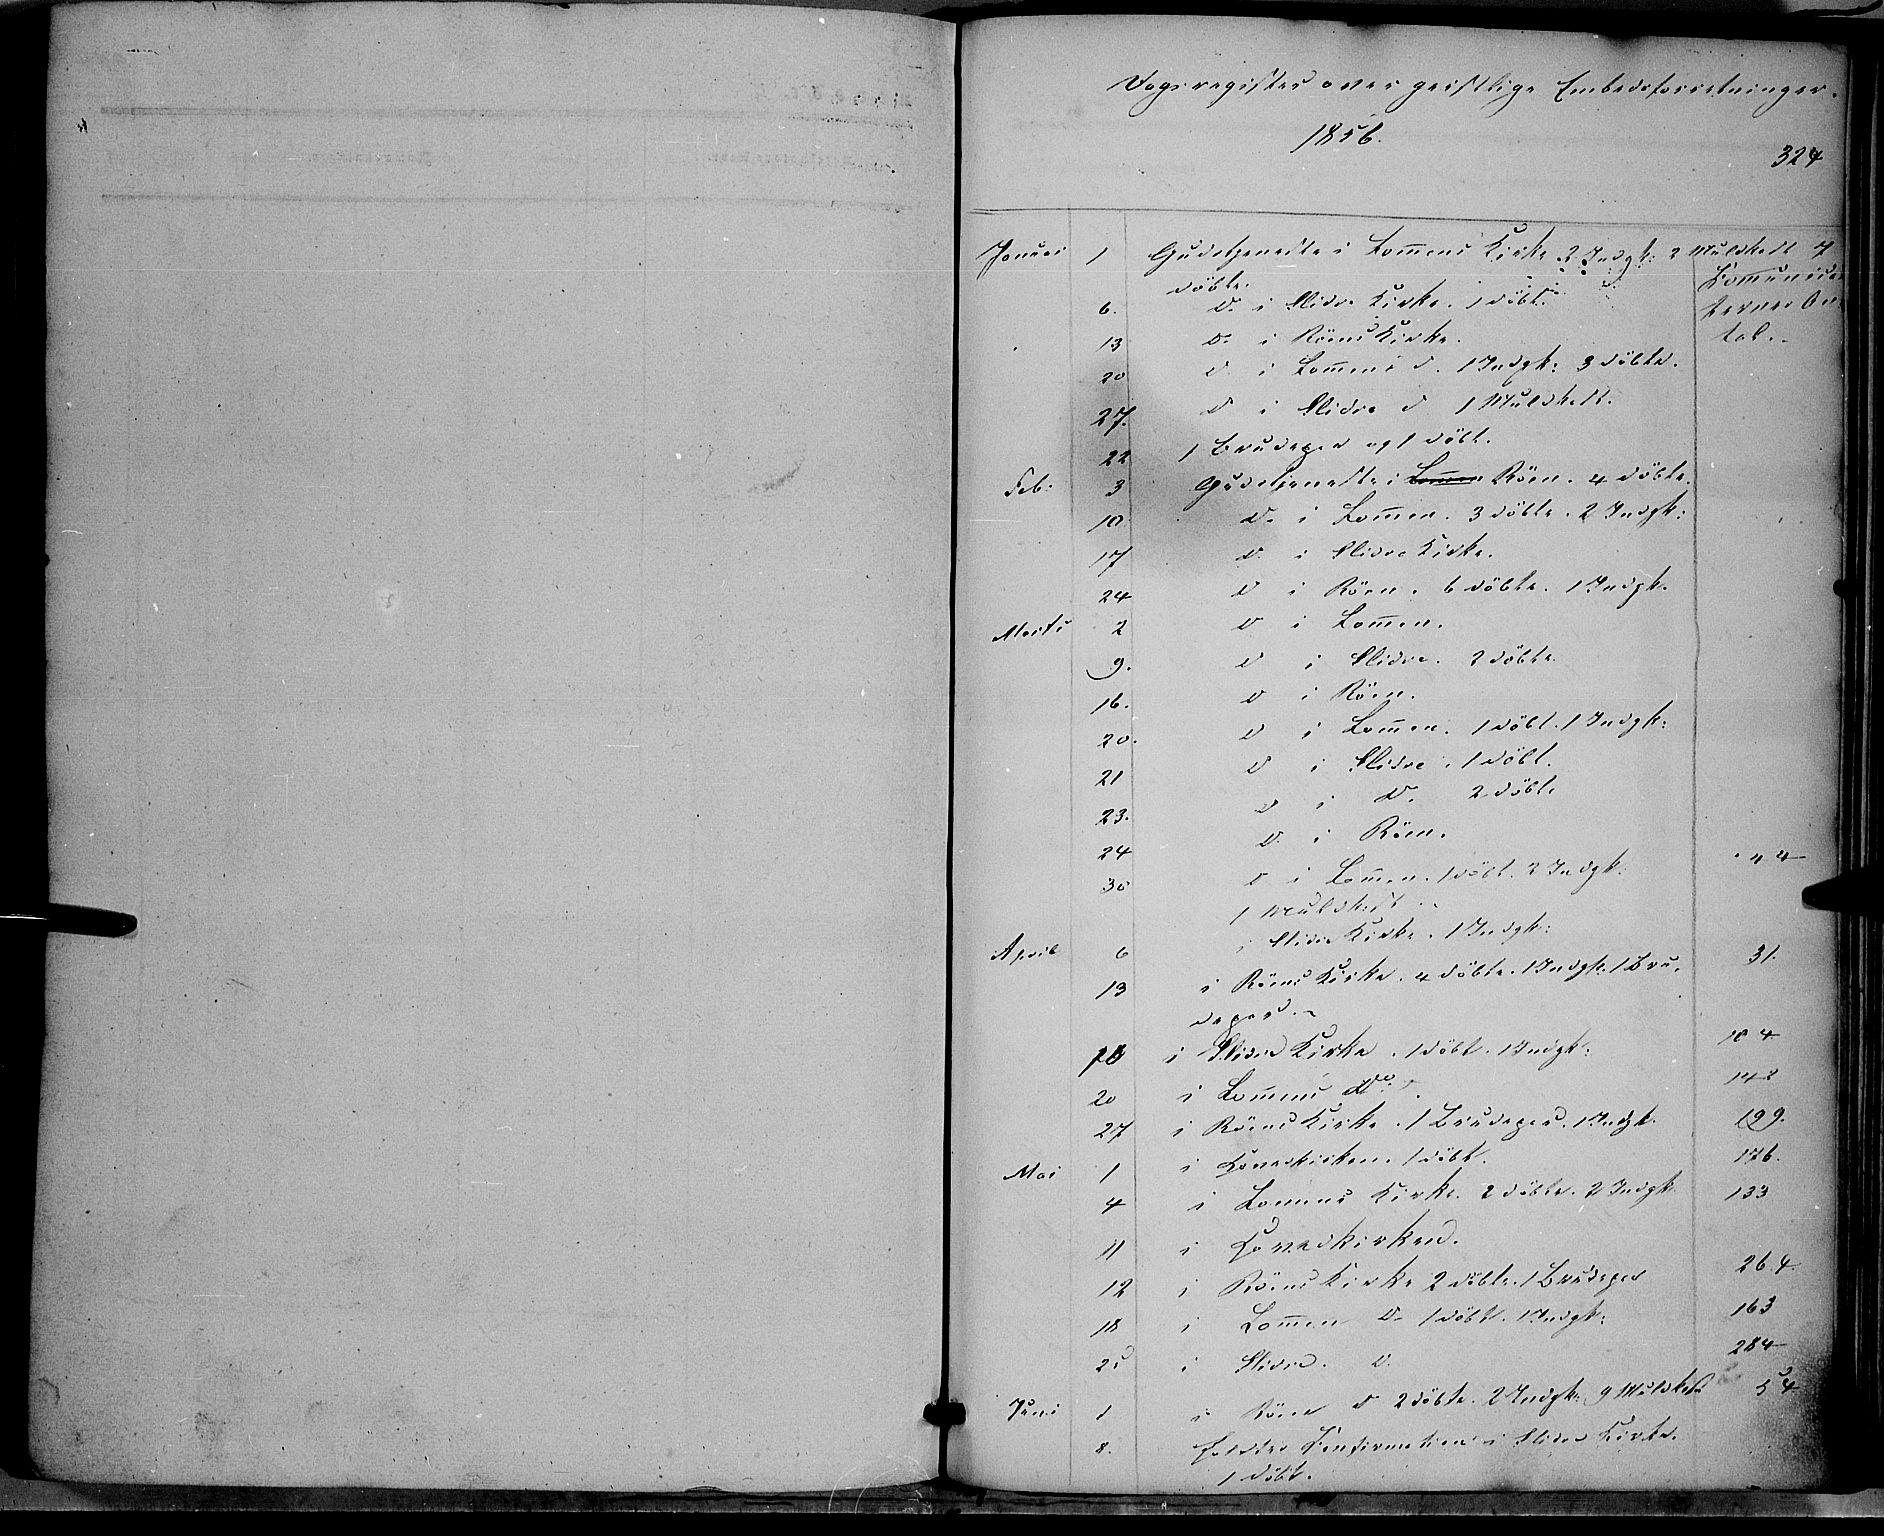 SAH, Vestre Slidre prestekontor, Ministerialbok nr. 2, 1856-1864, s. 324